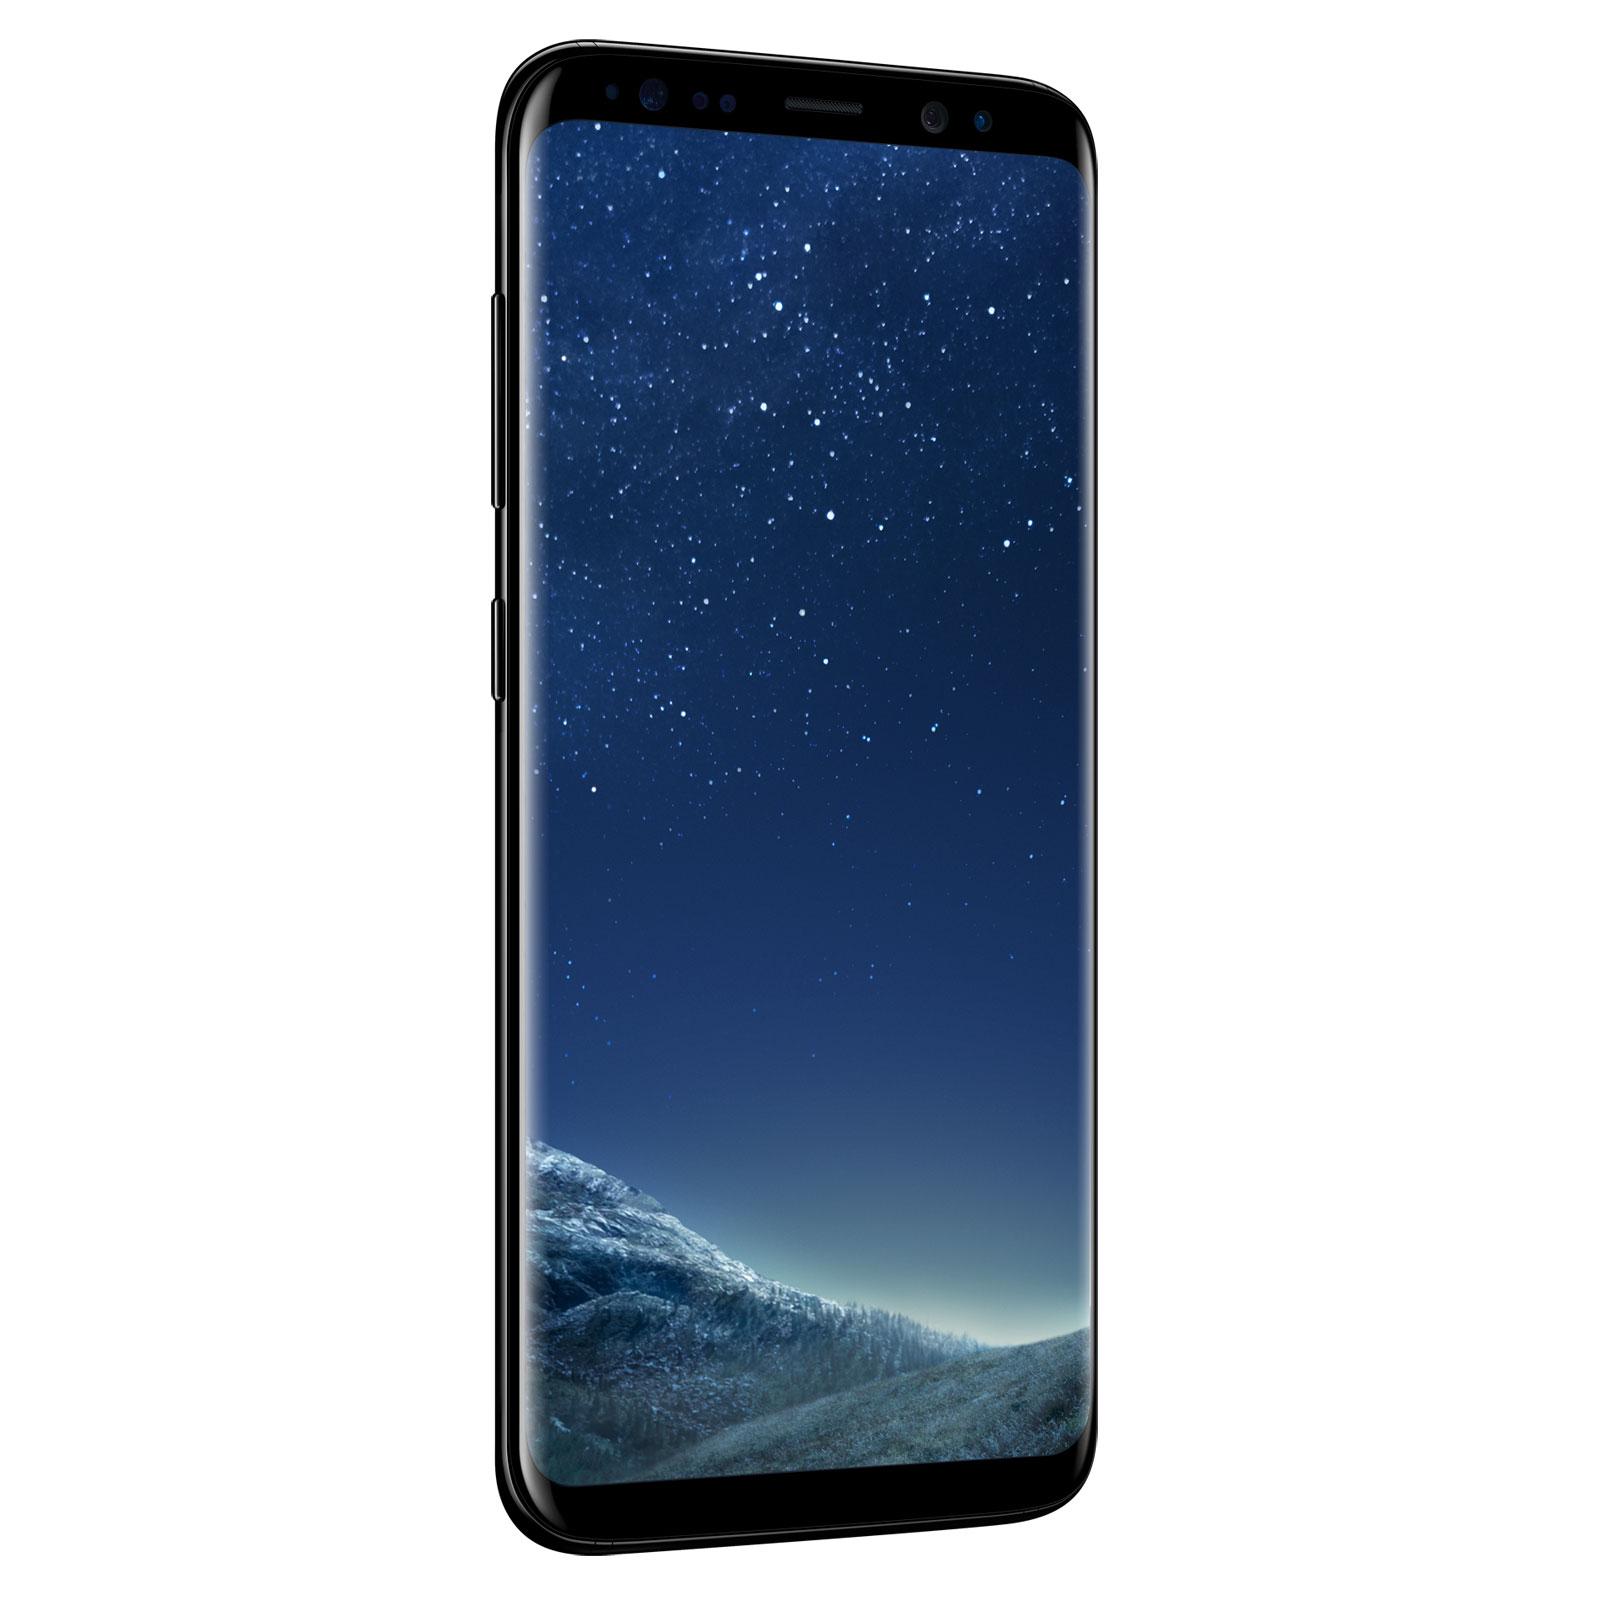 10 de r duction sur les smartphones ex smartphone 5 8 samsung galaxy s8 4 go ram 64 go. Black Bedroom Furniture Sets. Home Design Ideas